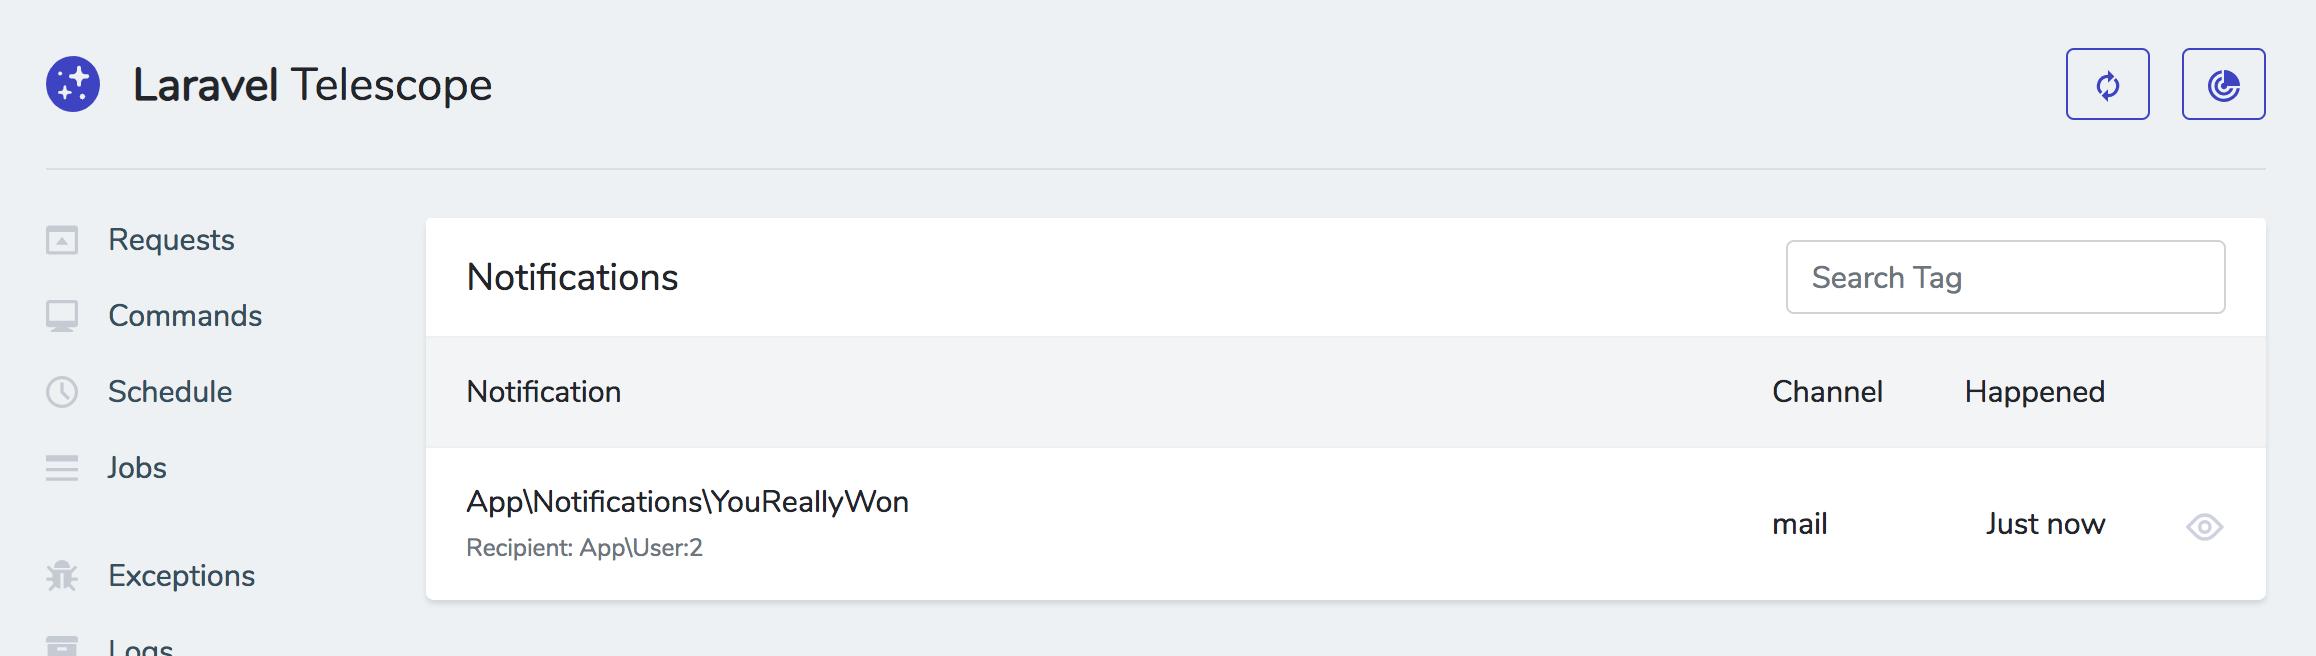 What's new in Laravel 5 7? - Quora